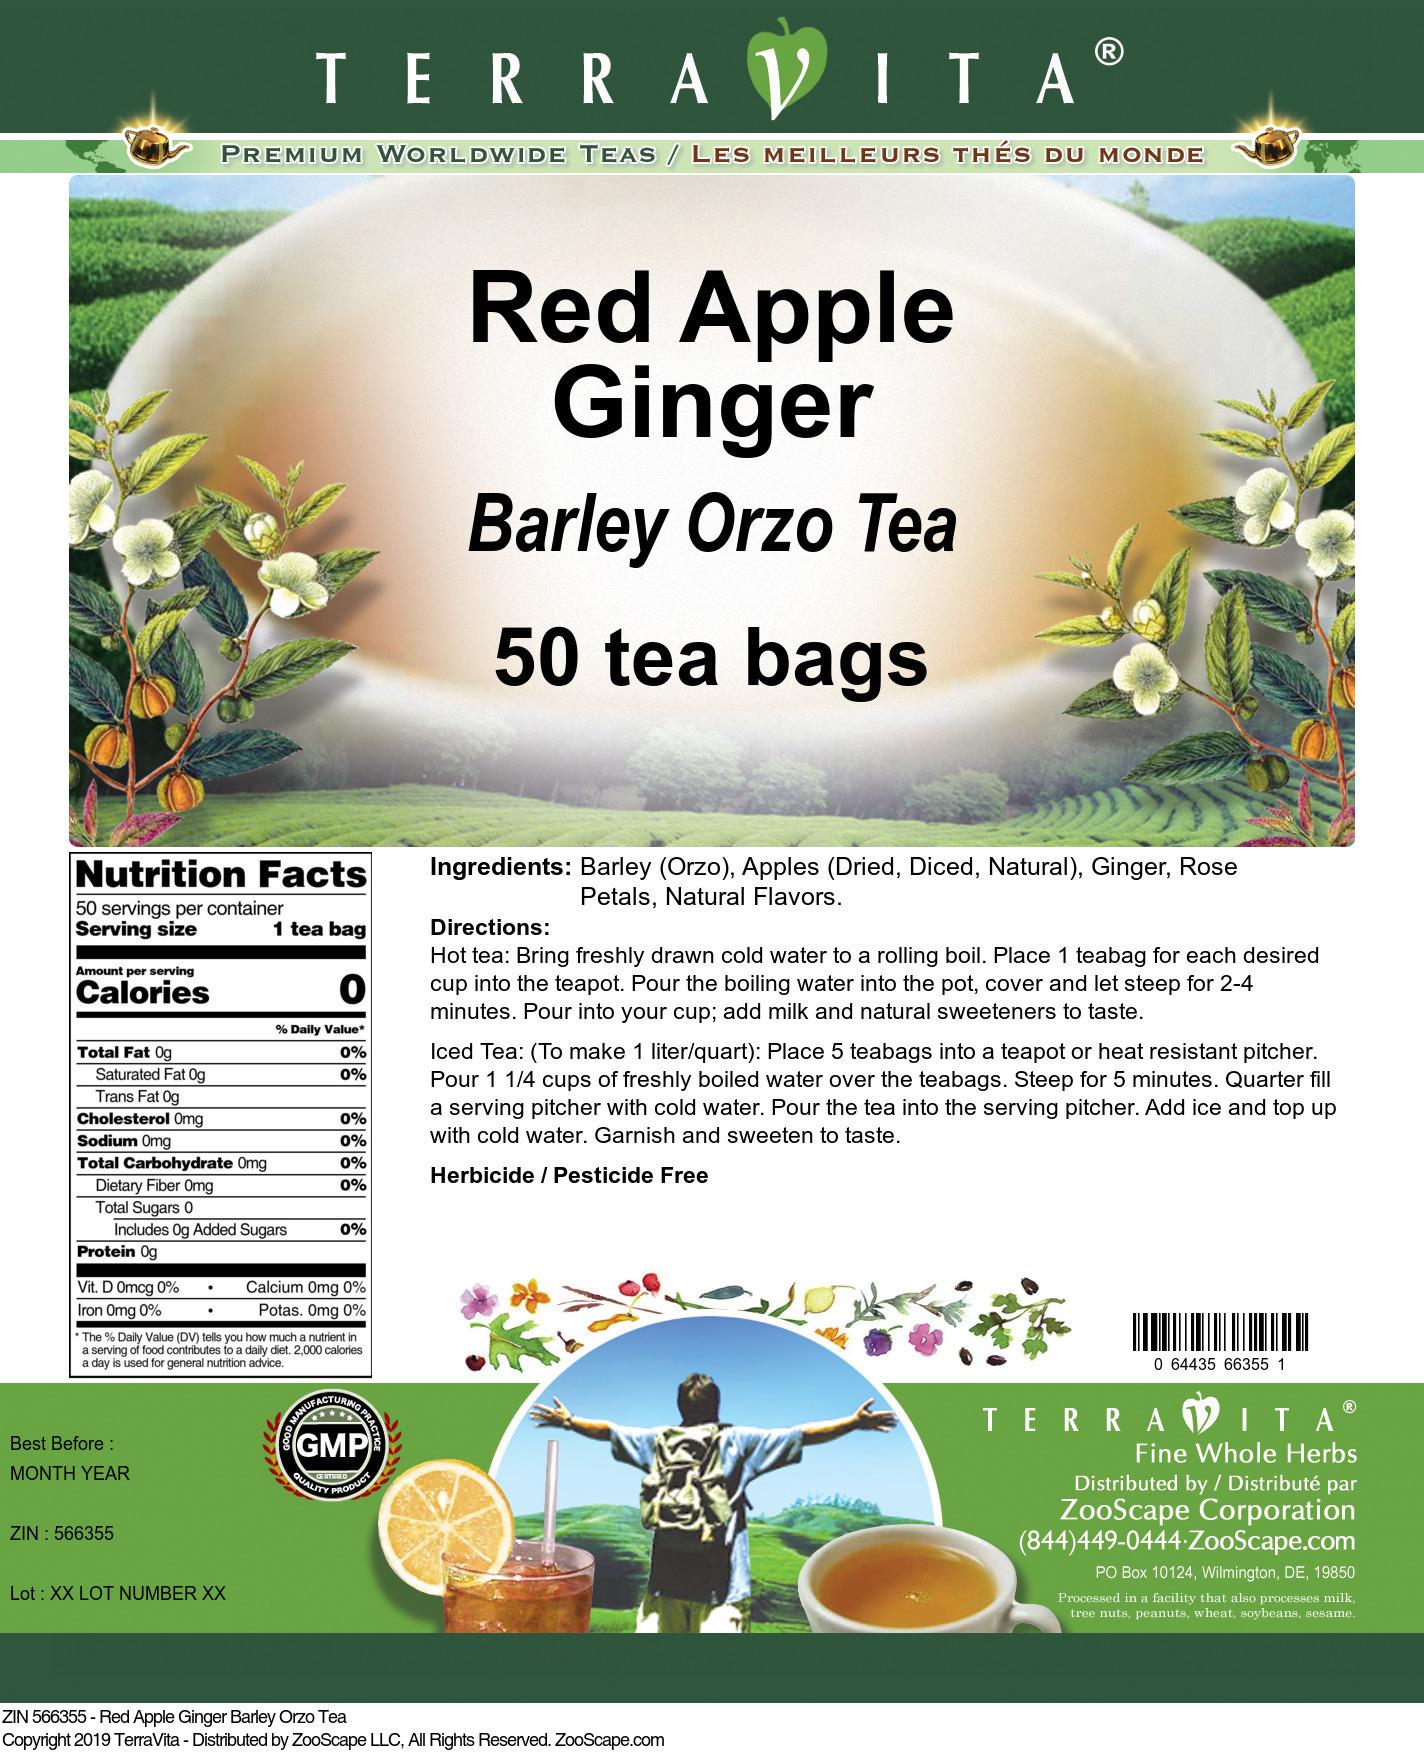 Red Apple Ginger Barley Orzo Tea